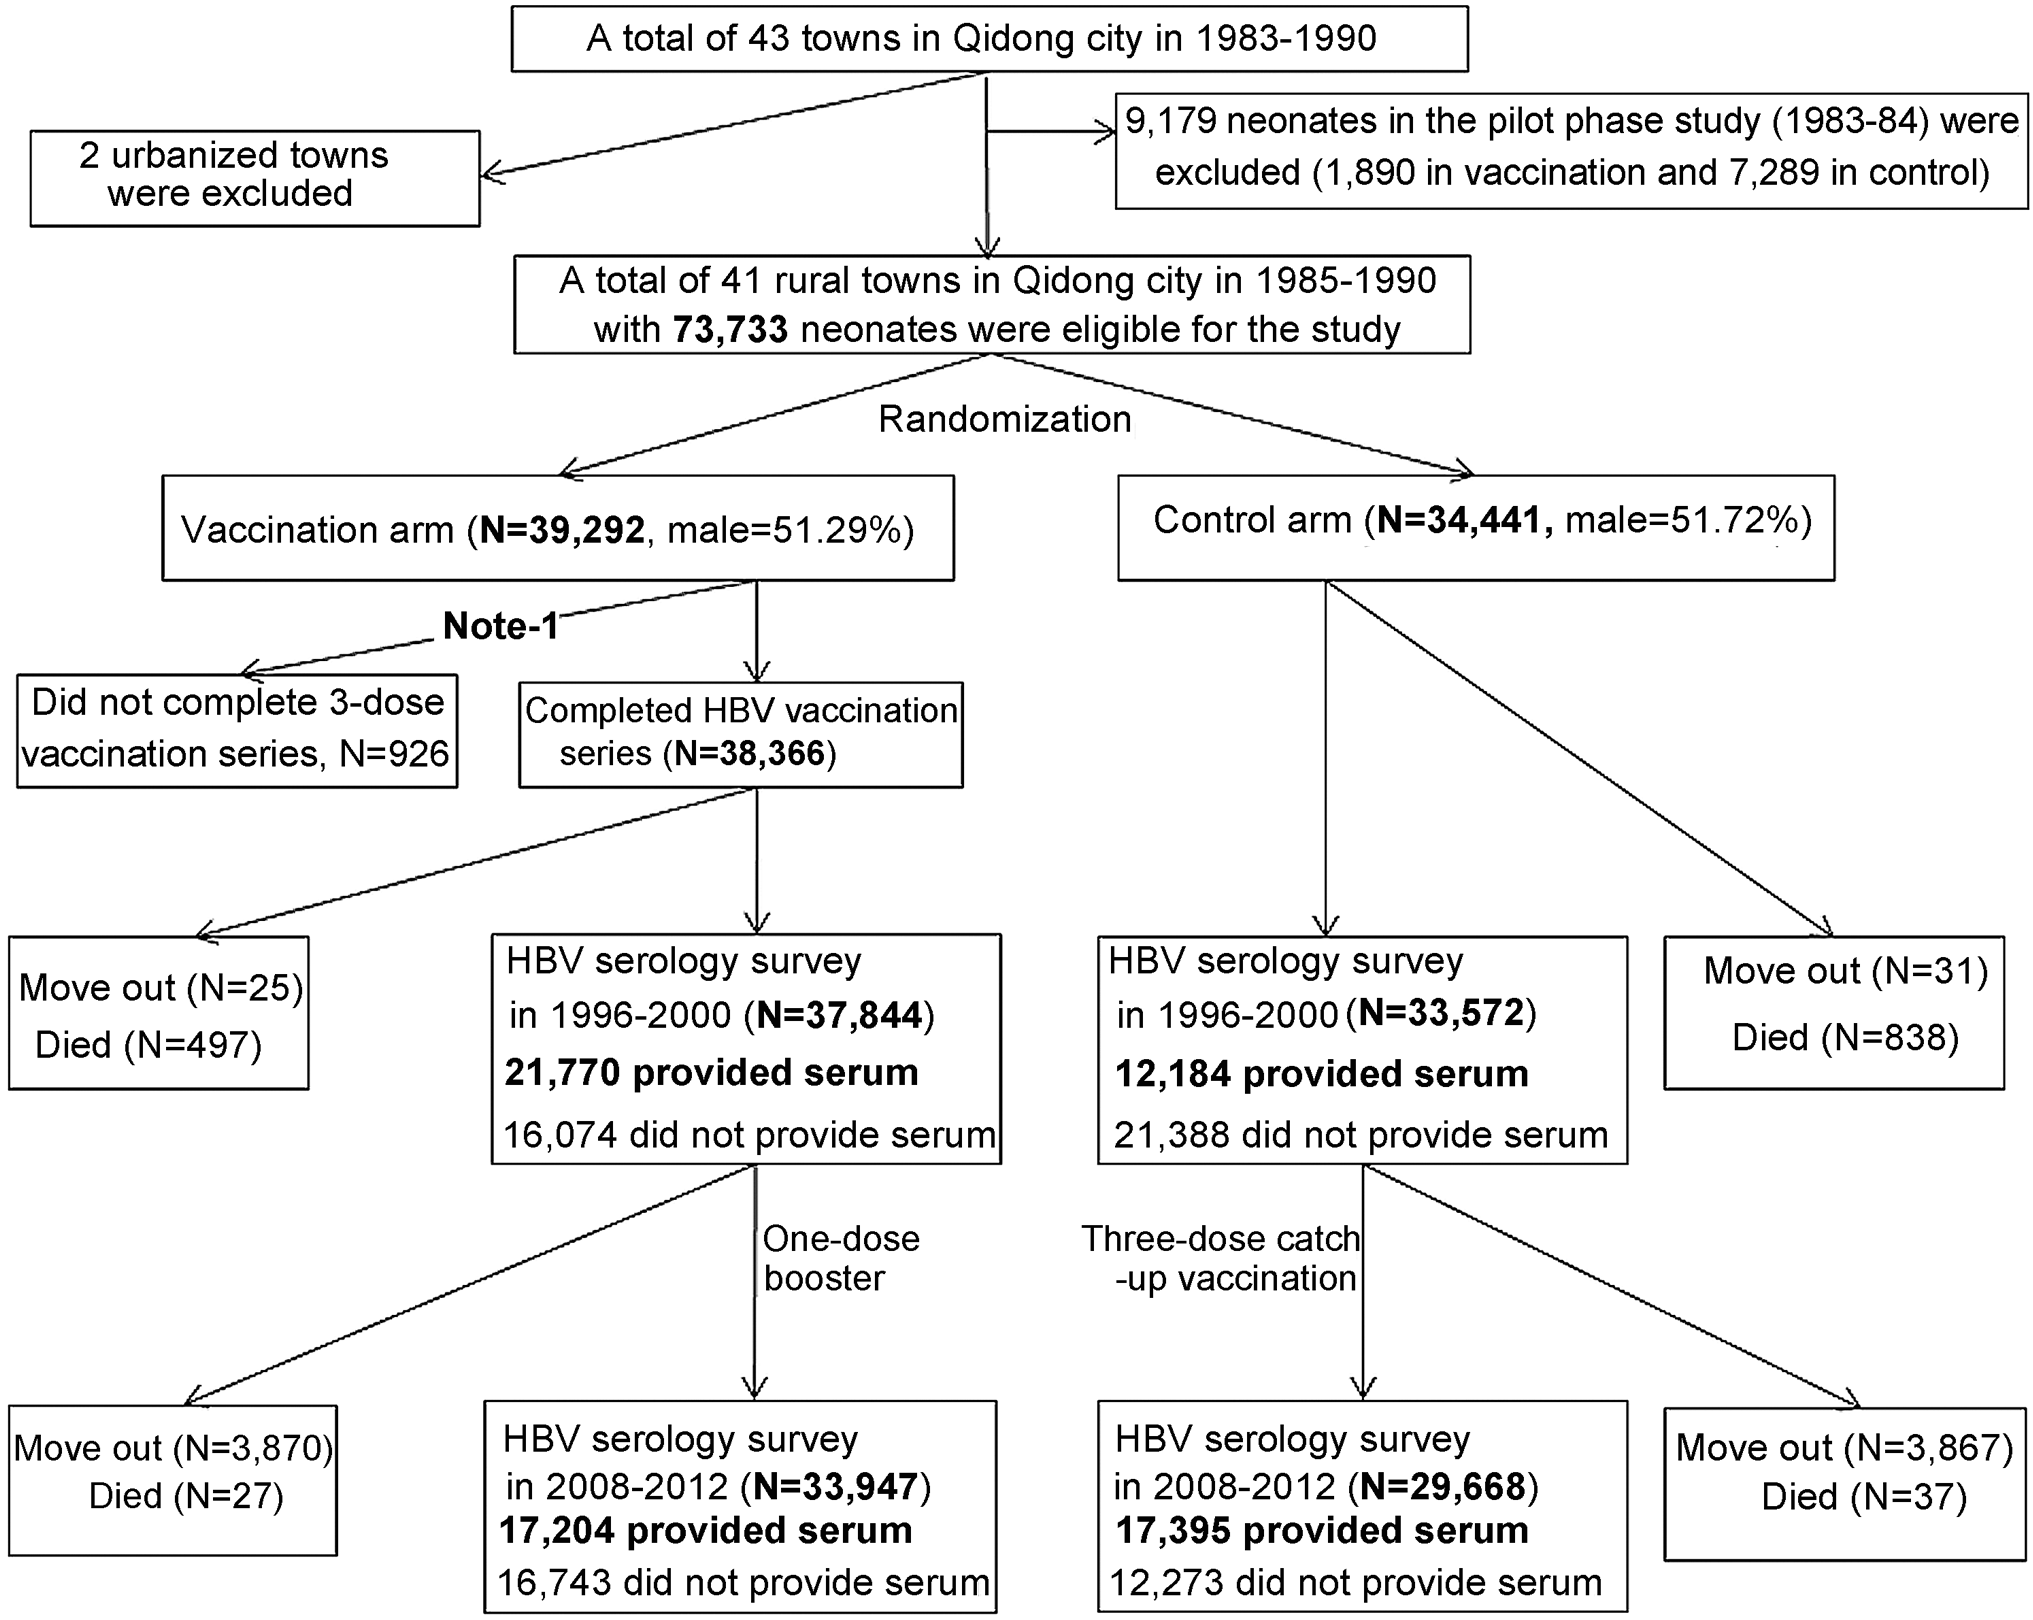 Flow-chart of the Qidong Hepatitis B Intervention Study.